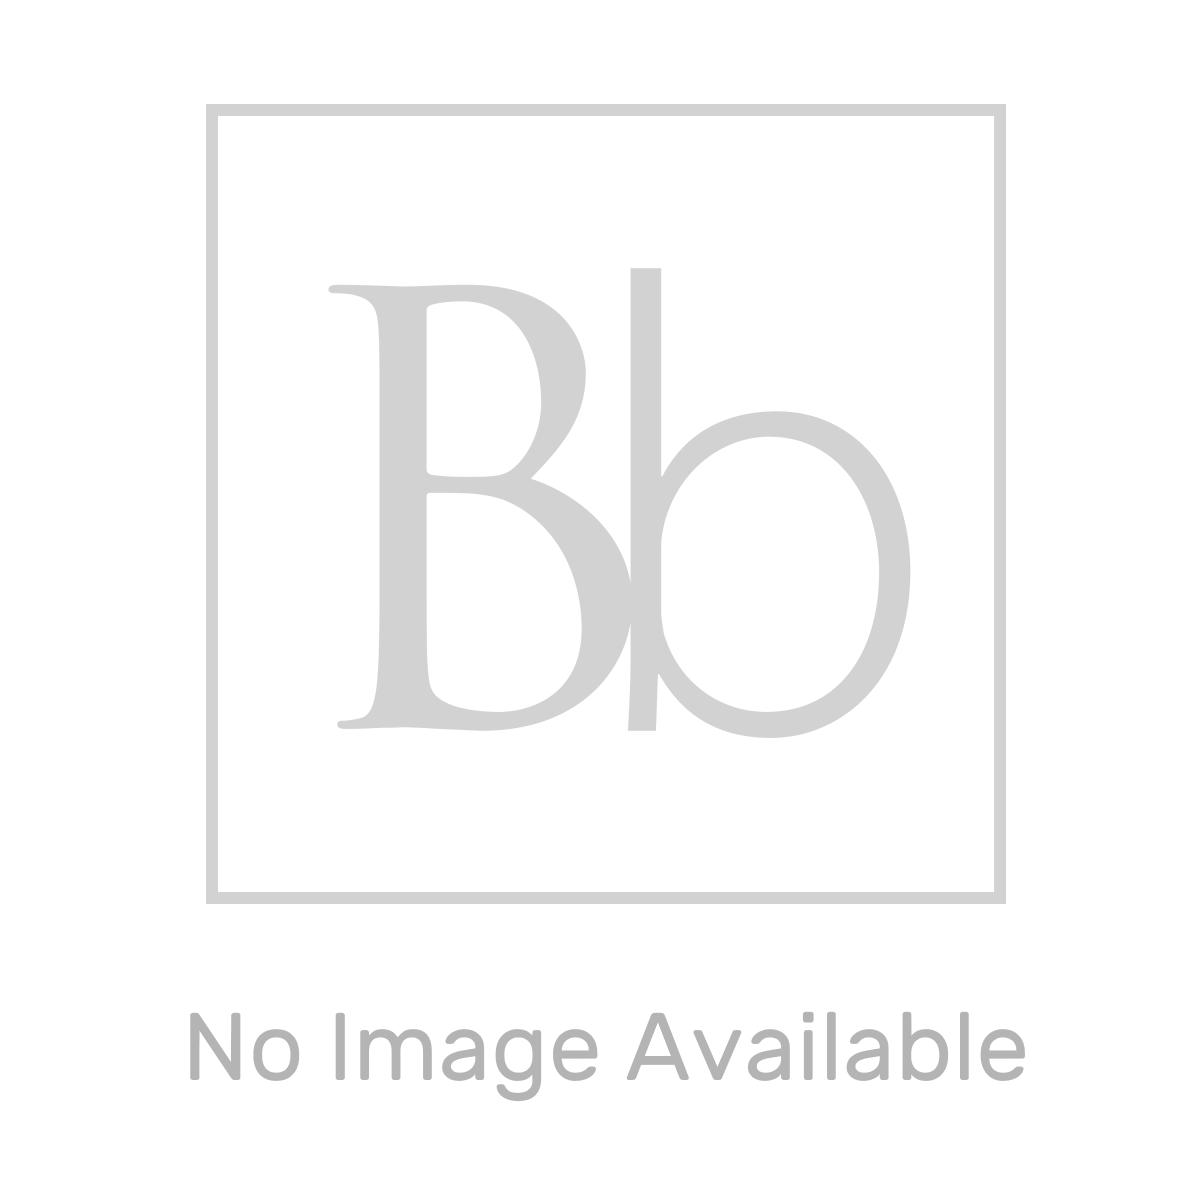 Frontline Blok Avola Grey Wooden Shower Bath Front Panel 1700mm - Right Hand